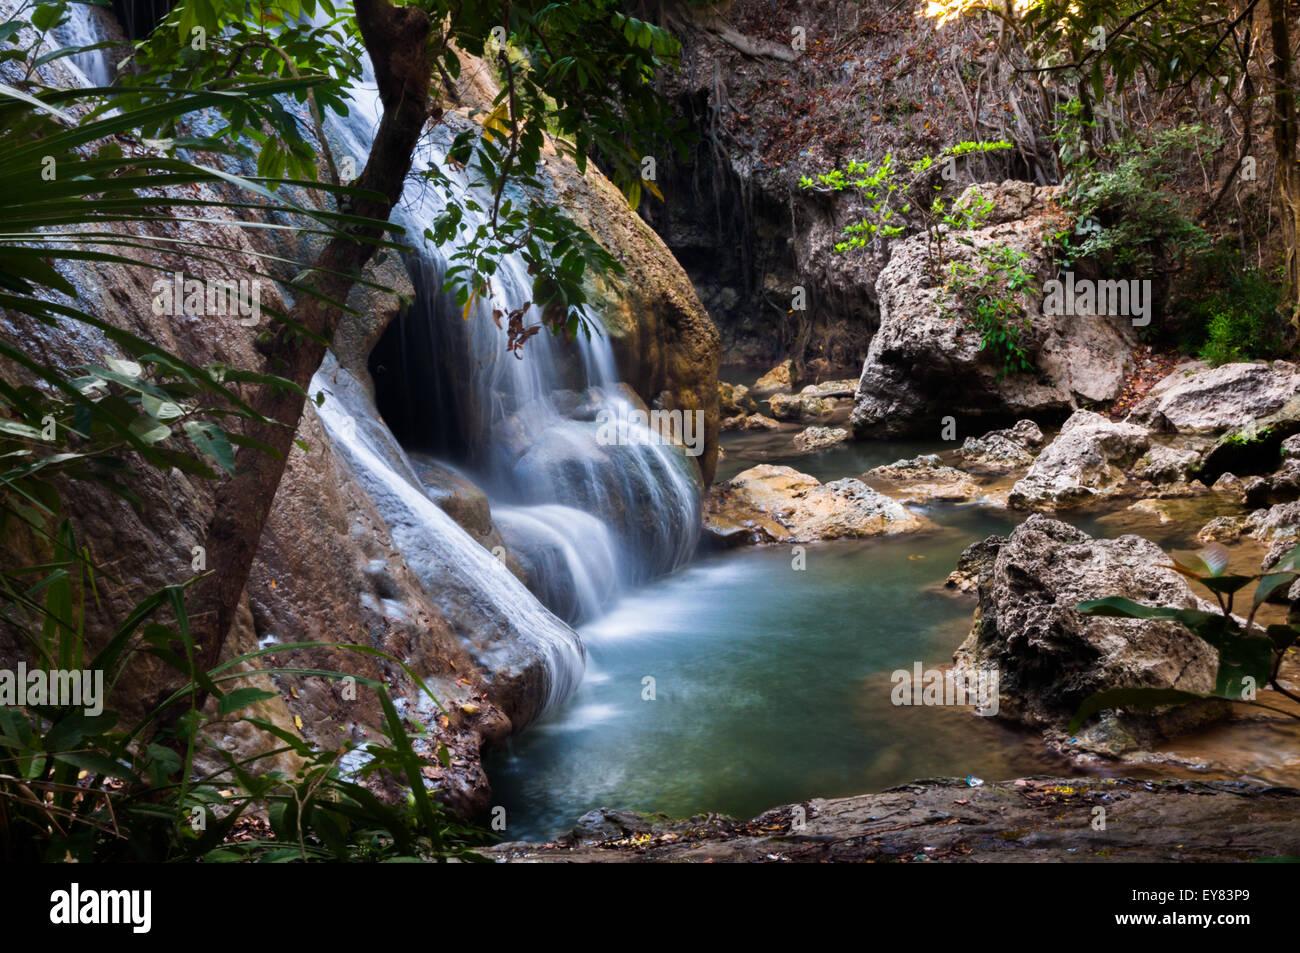 Oenesu Wasserfall in Kupang, Timor Island, Indonesien. Stockbild